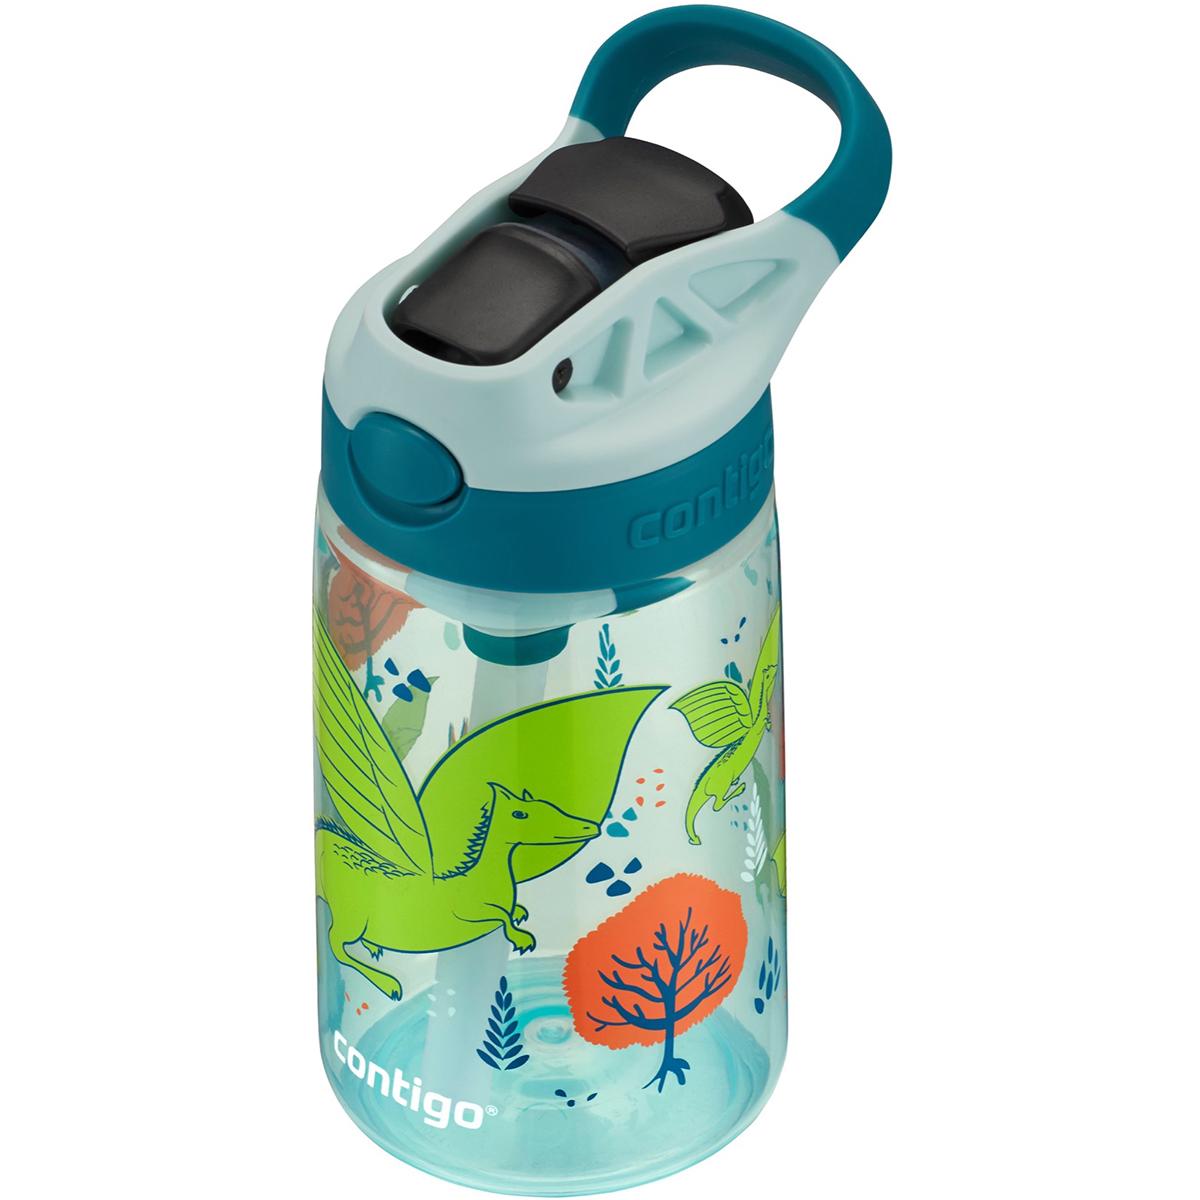 Contigo-Kid-039-s-14-oz-AutoSpout-Straw-Water-Bottle-with-Easy-Clean-Lid thumbnail 12